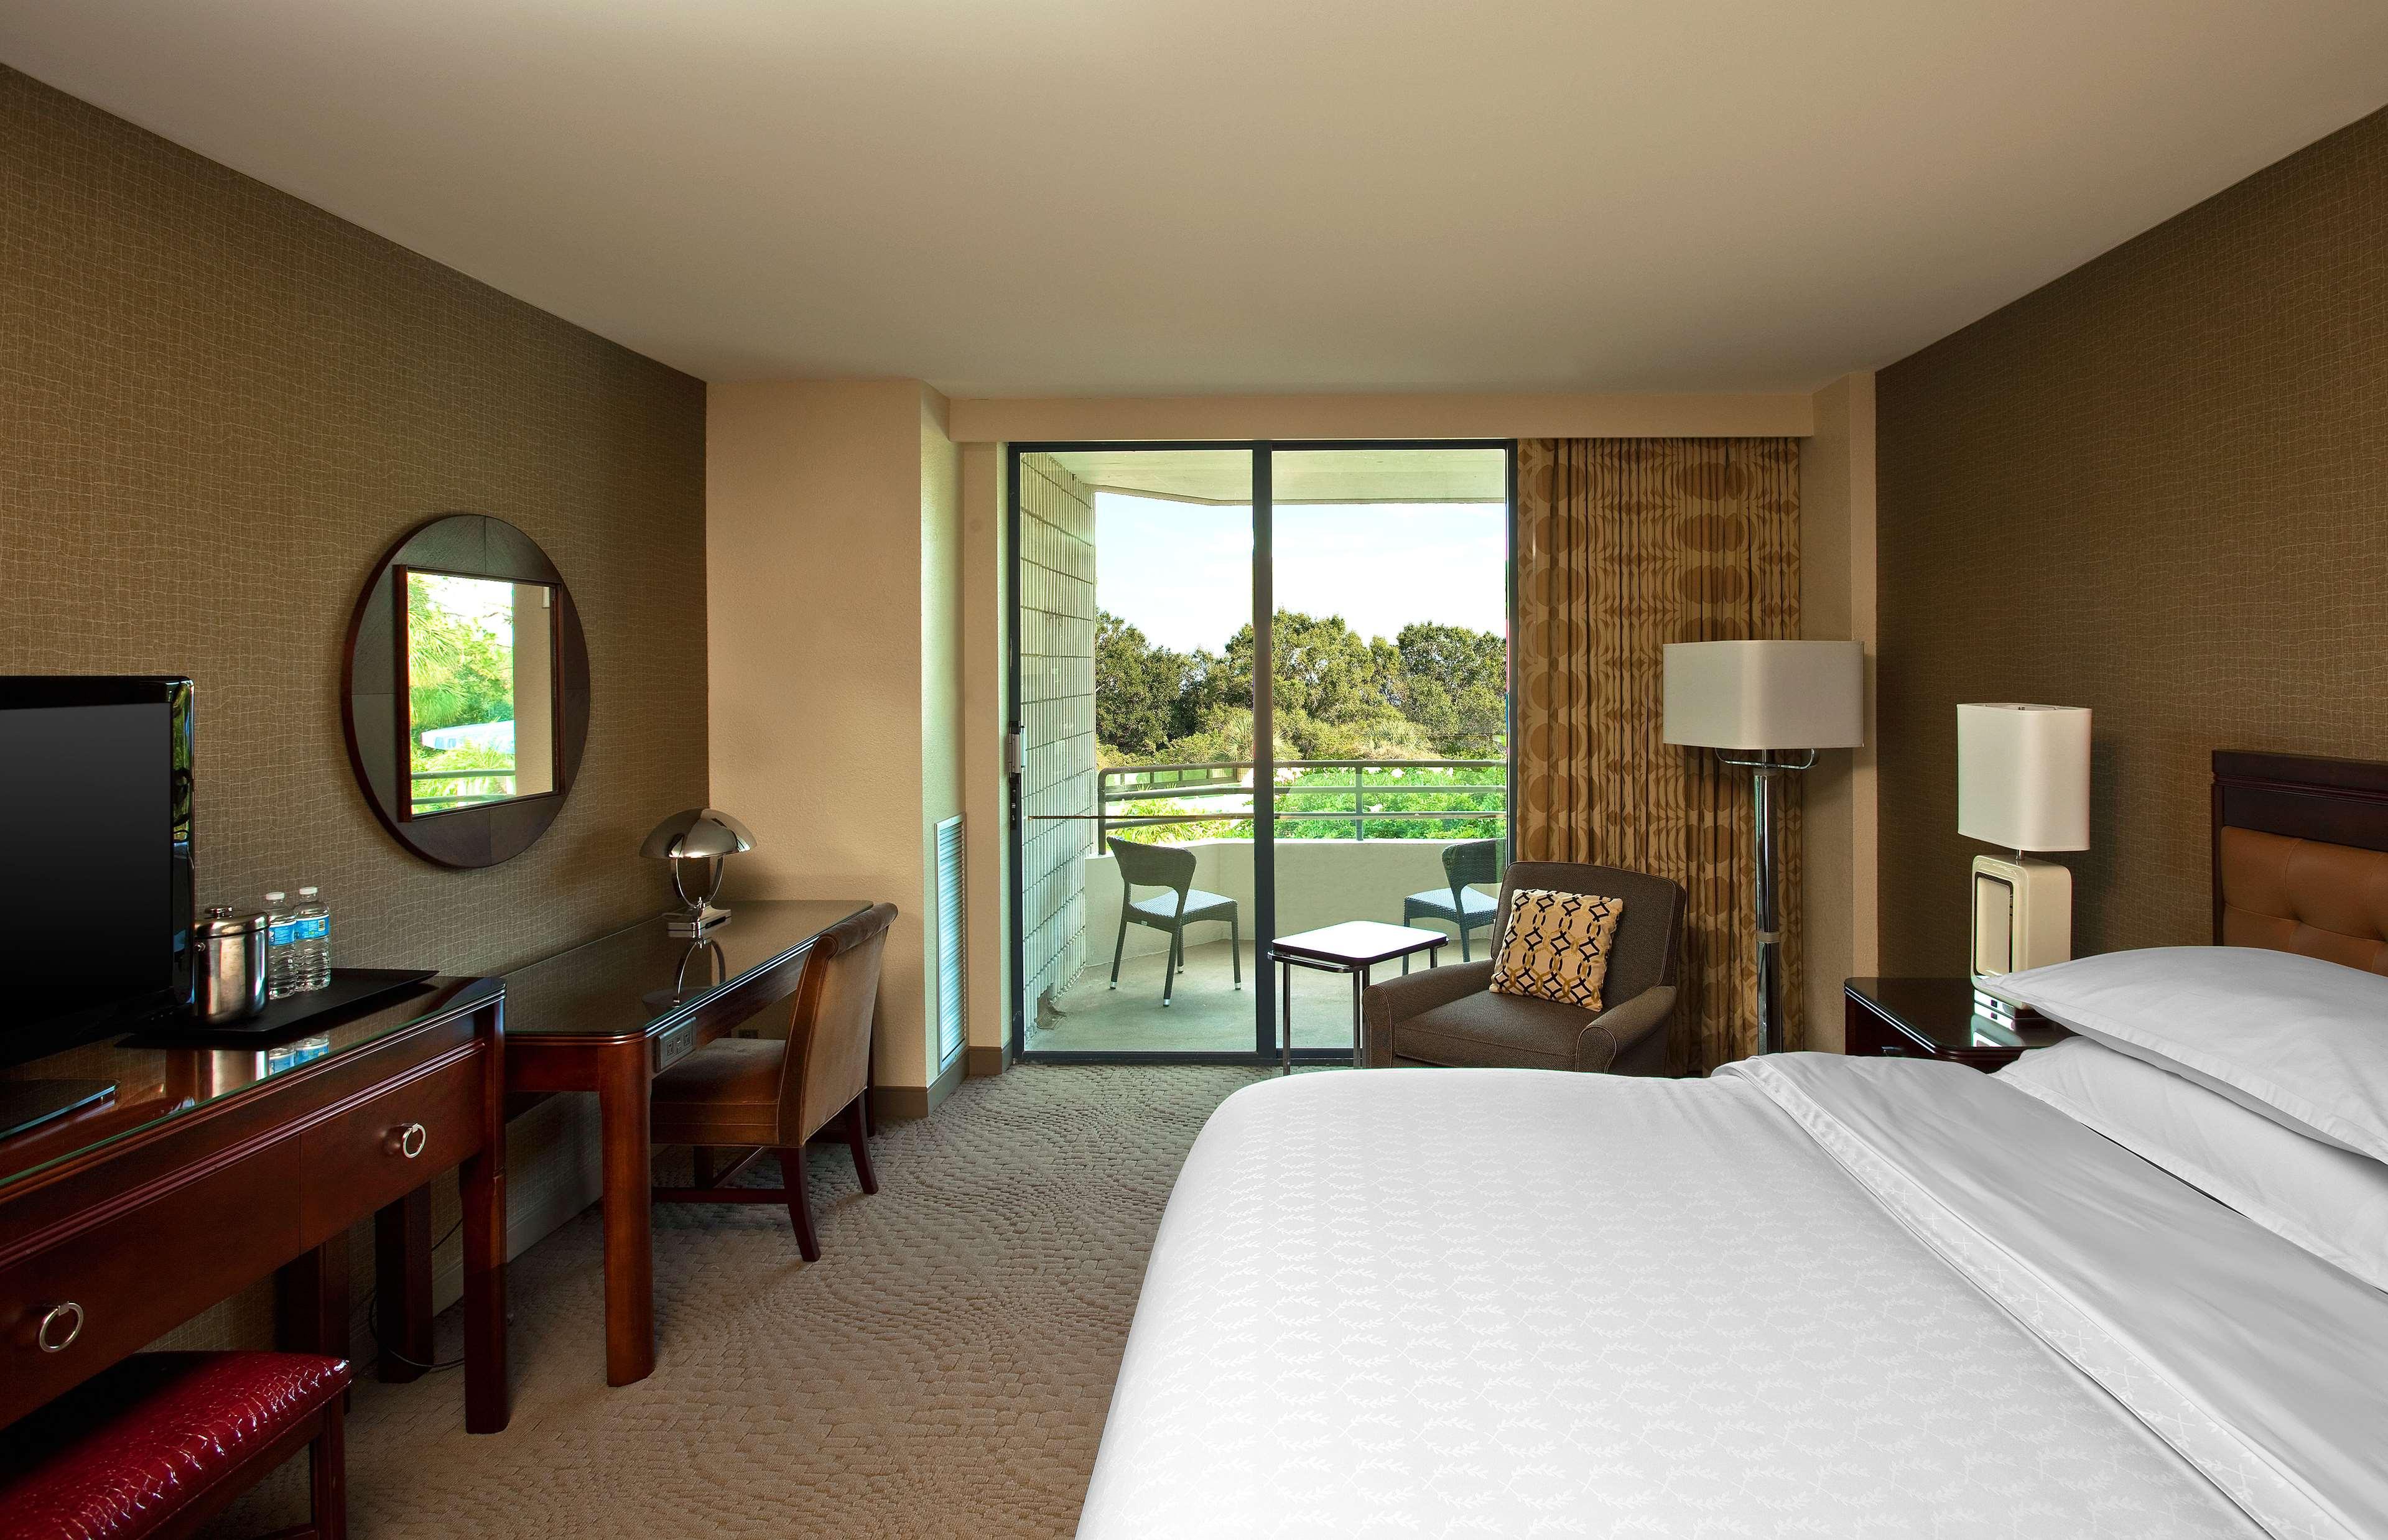 Sheraton Tampa Brandon Hotel image 5